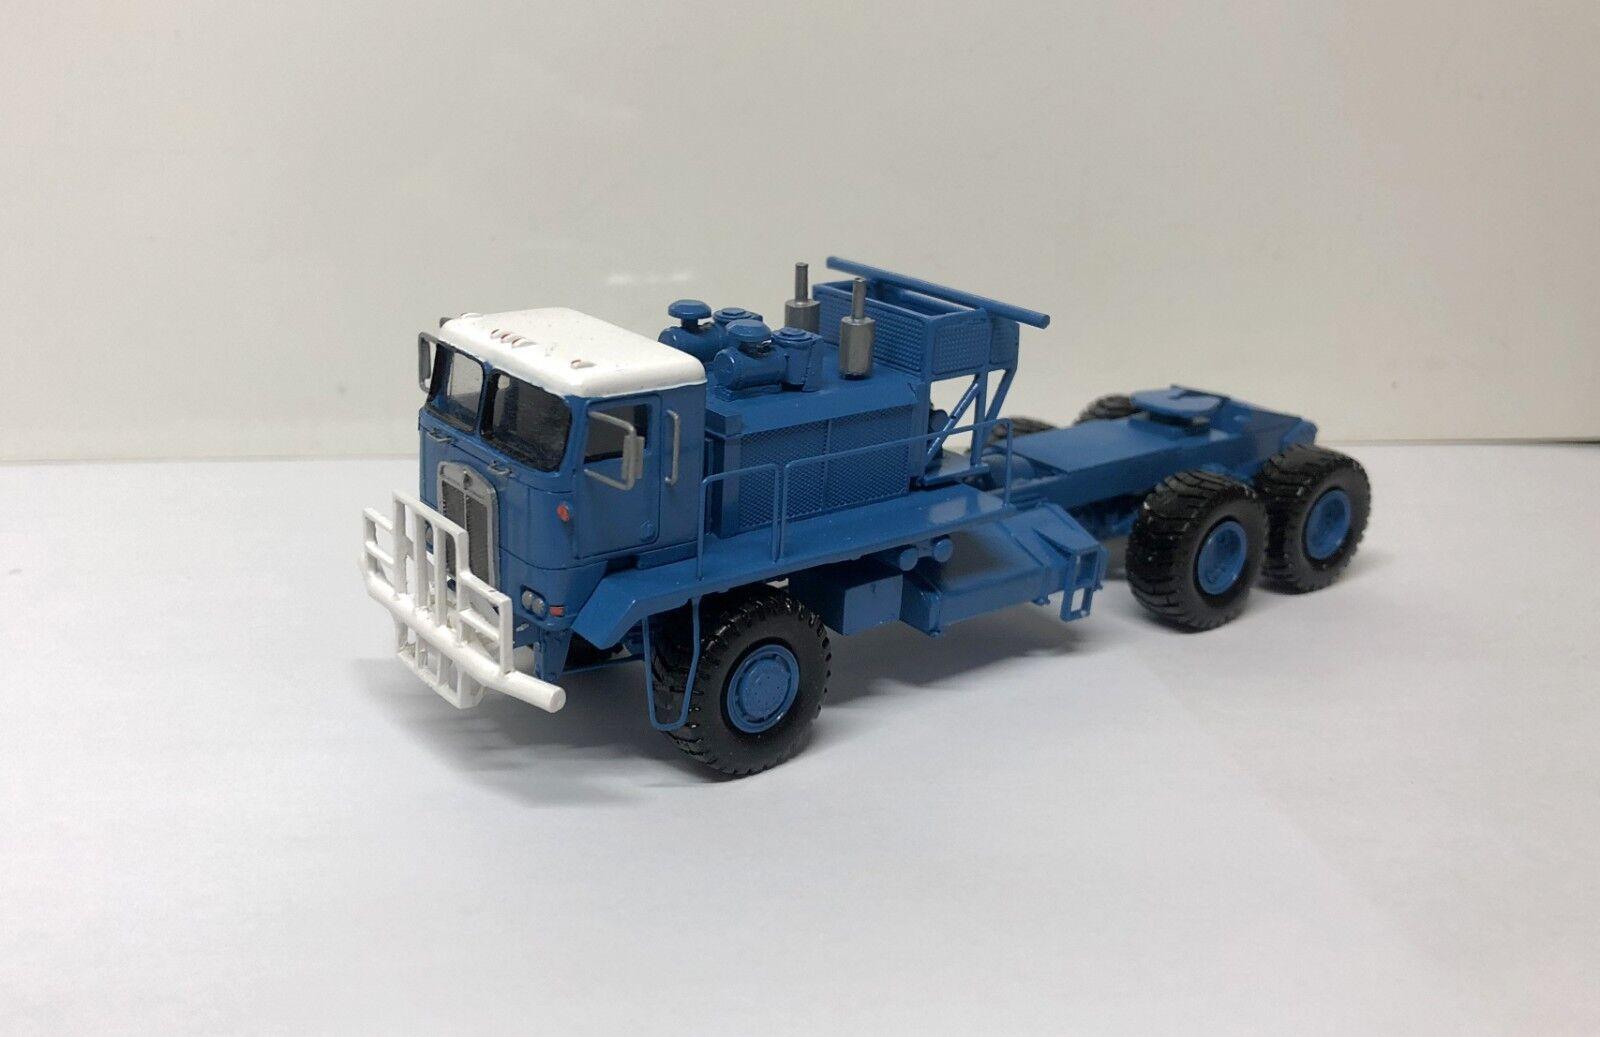 HO 1 87 Kenworth 993 COE Oilfield - blueee - Ready Made Resin Model